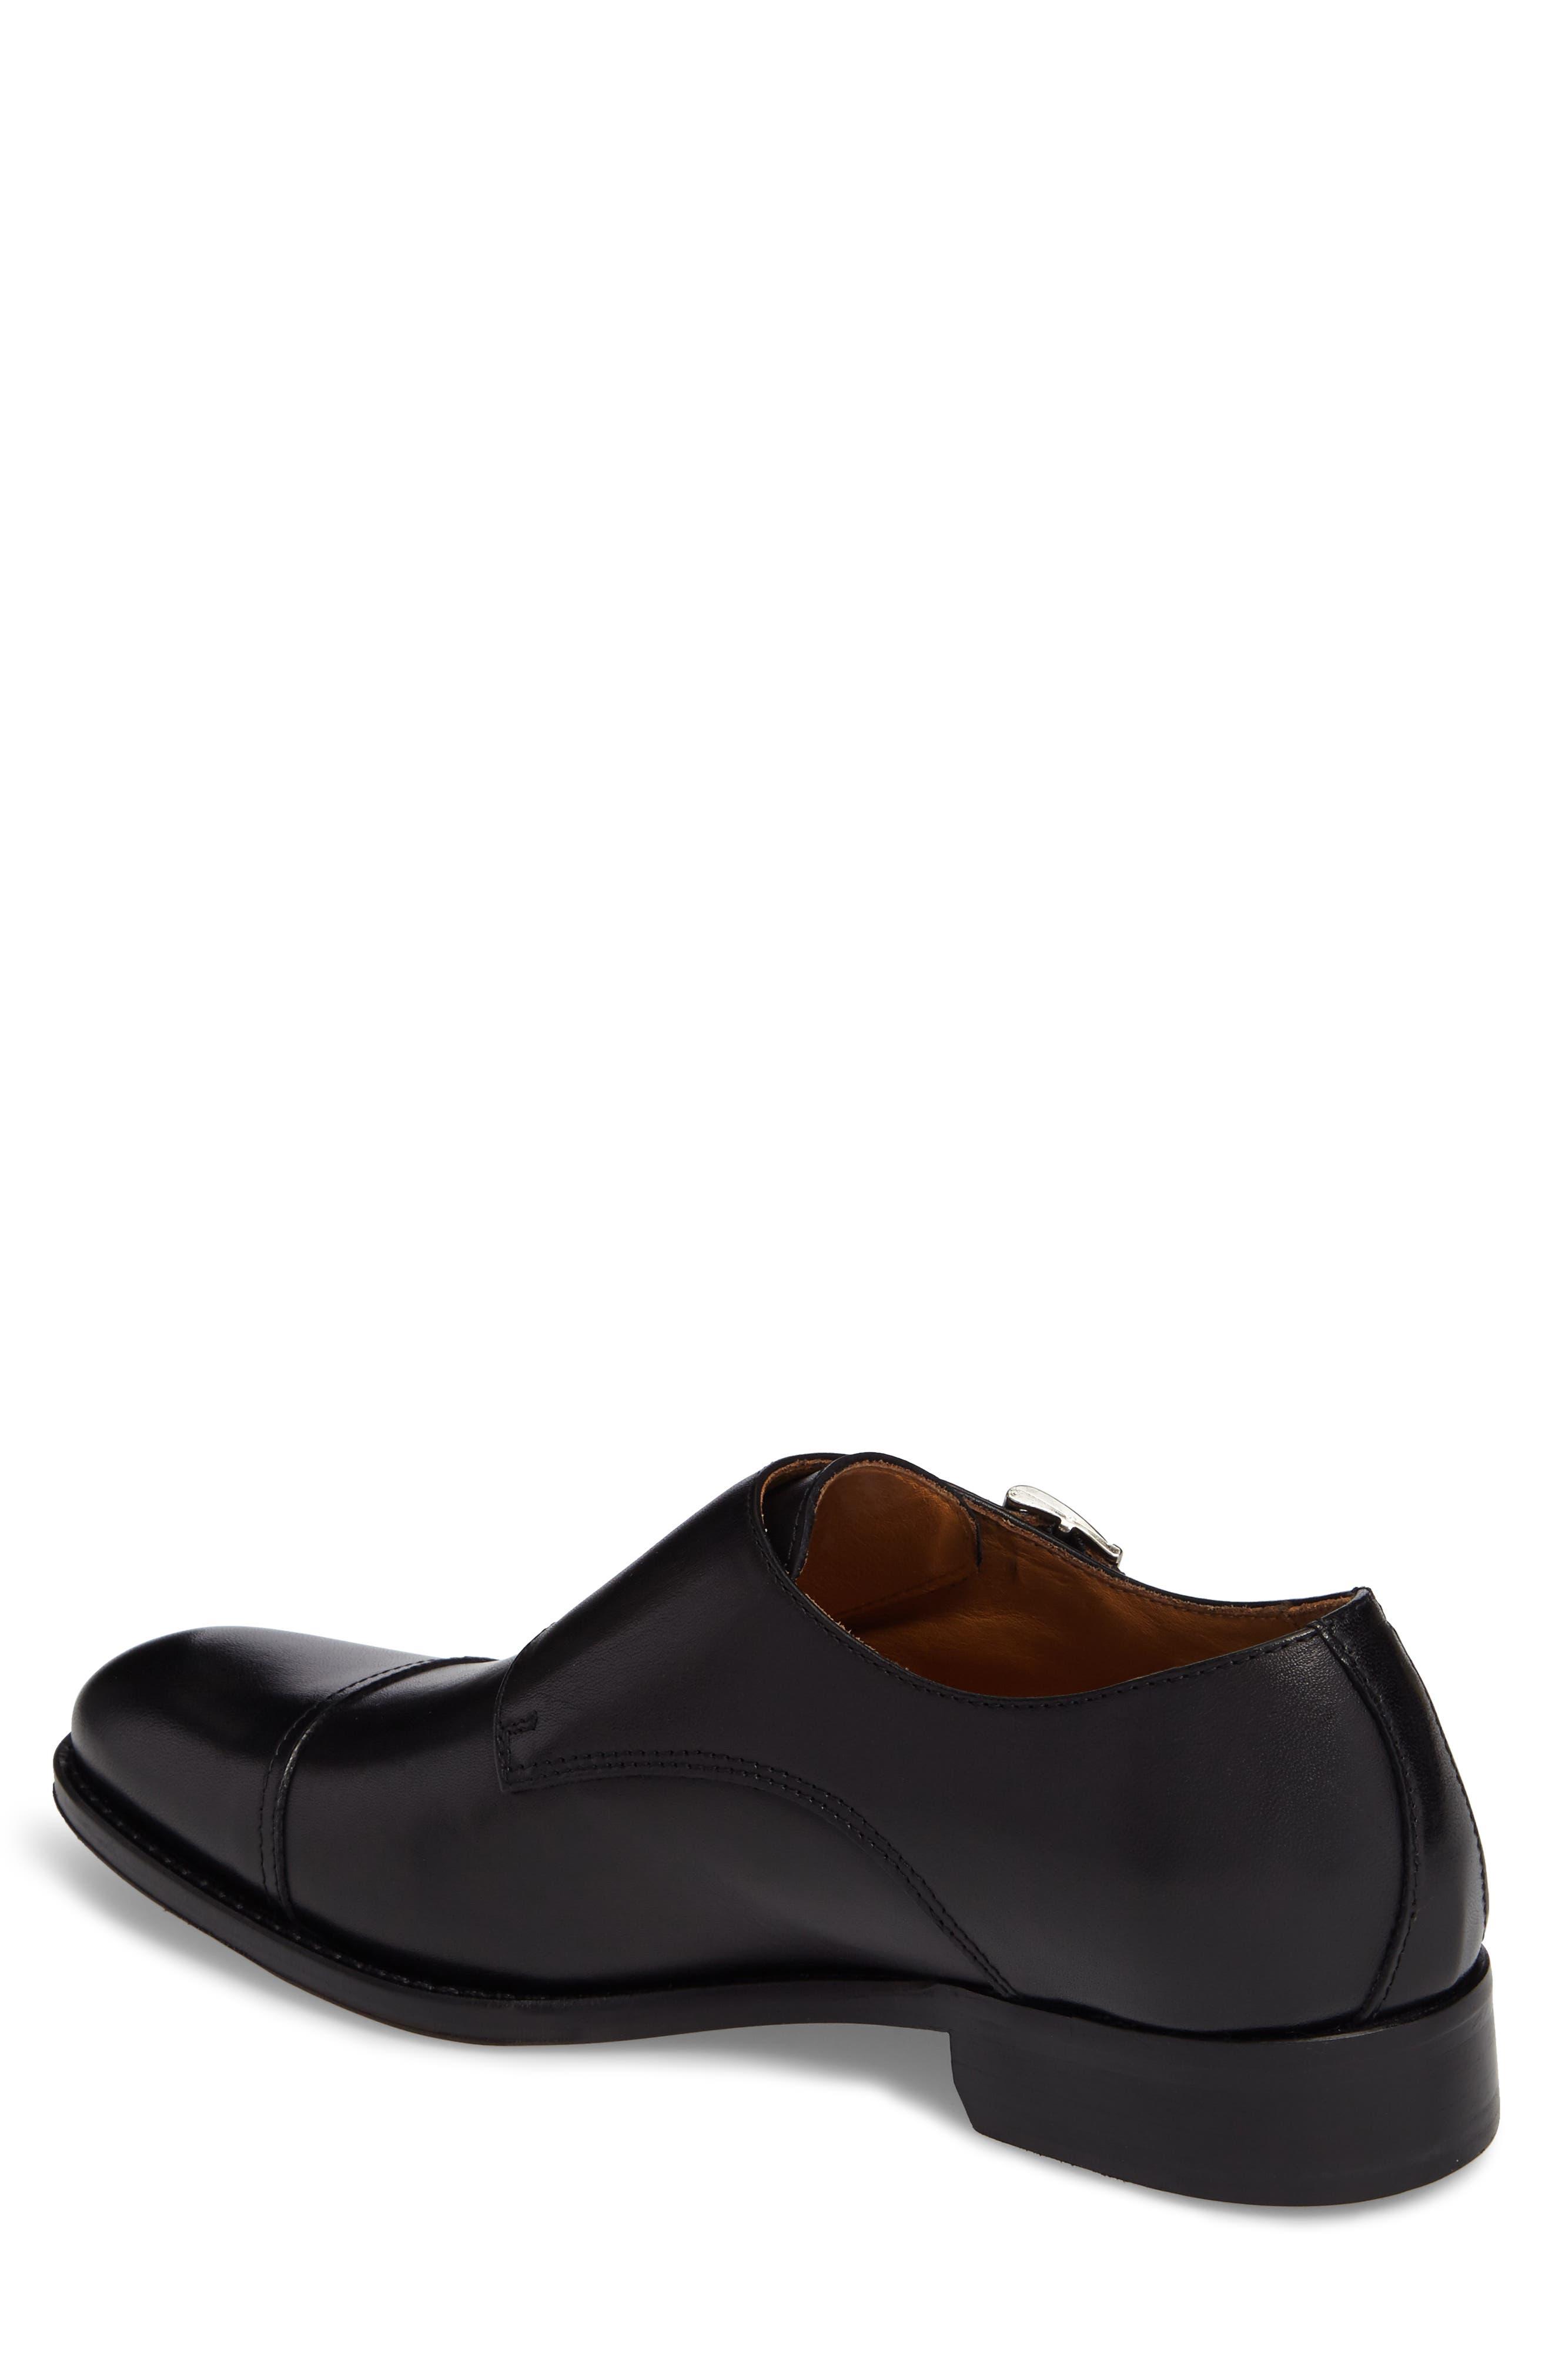 Alternate Image 2  - John W. Nordstrom® Stratton Double Monk Strap Shoe (Men)